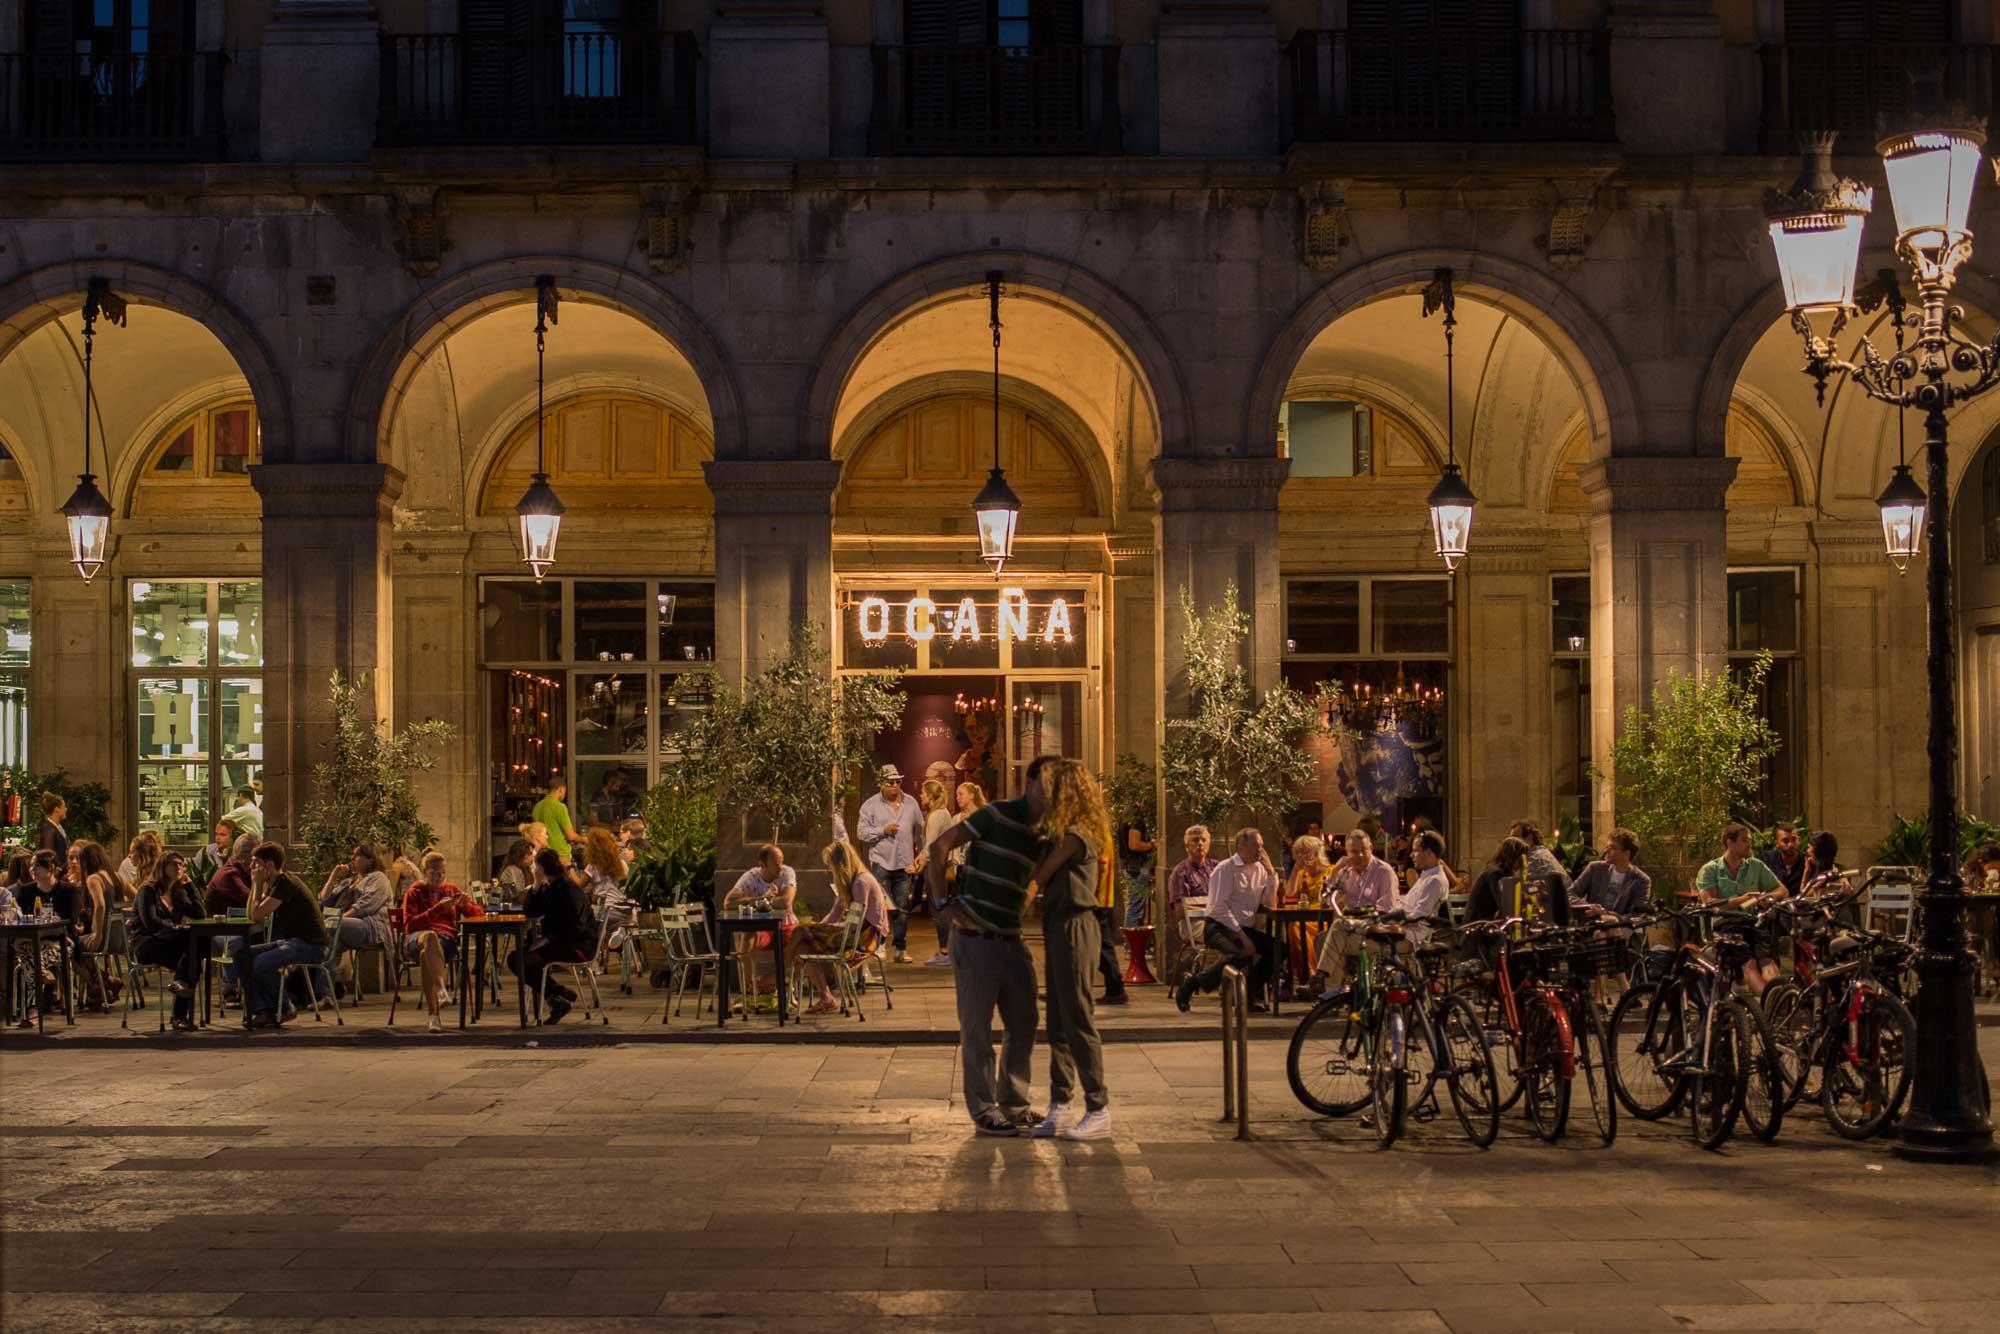 2014 — A couple making plans outside of Ocaña Restaurant in the Plaça Reial